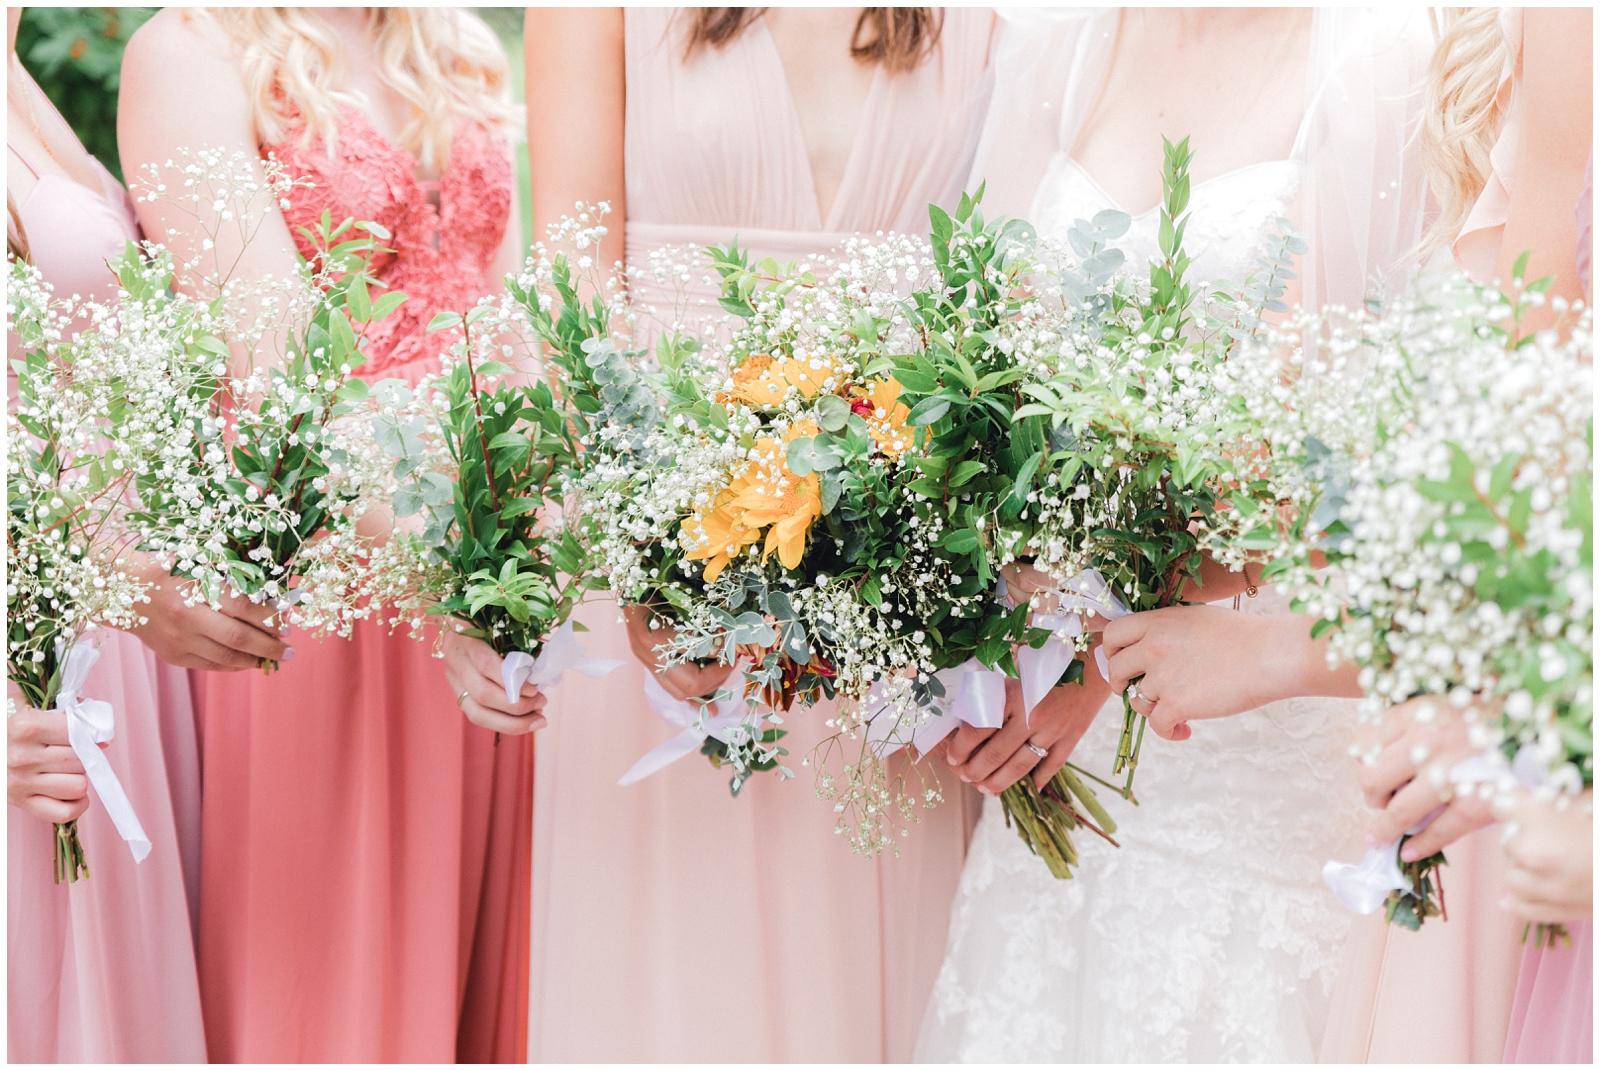 marietta-ohio-fall-wedding-LRA-Photo_0014.jpg